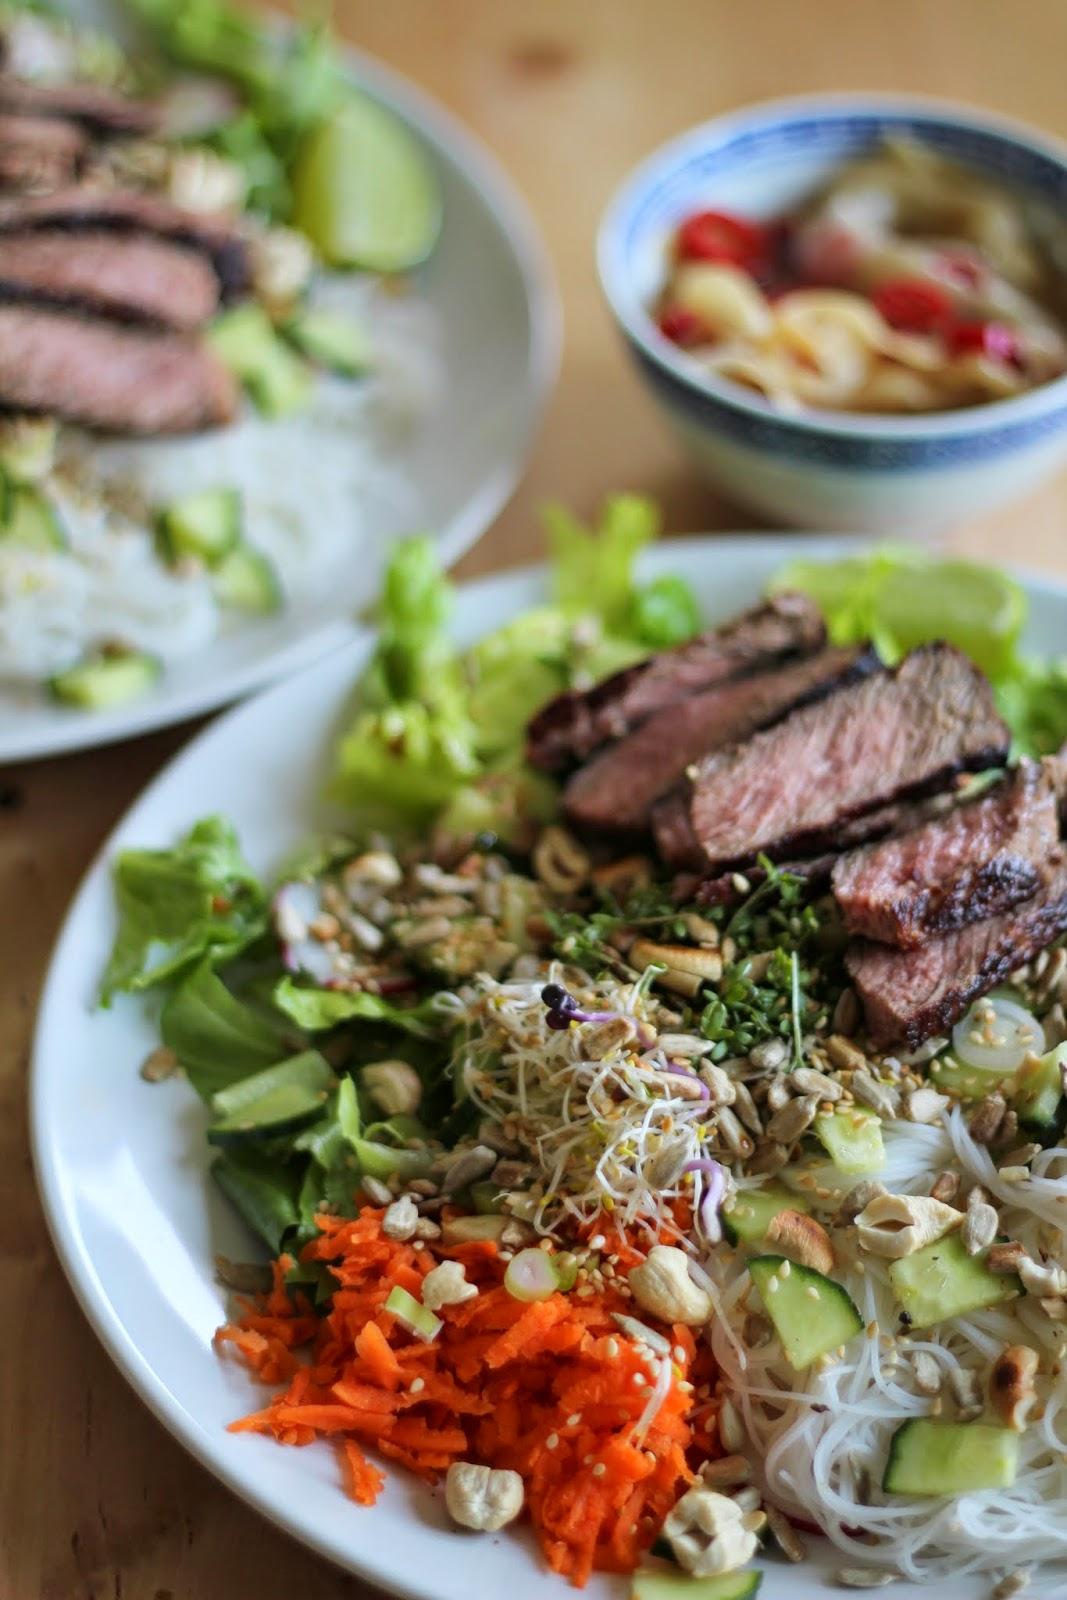 Cooking Casualties Steak Asiatisch Reisnudelsalat Mit Ingwerdressing